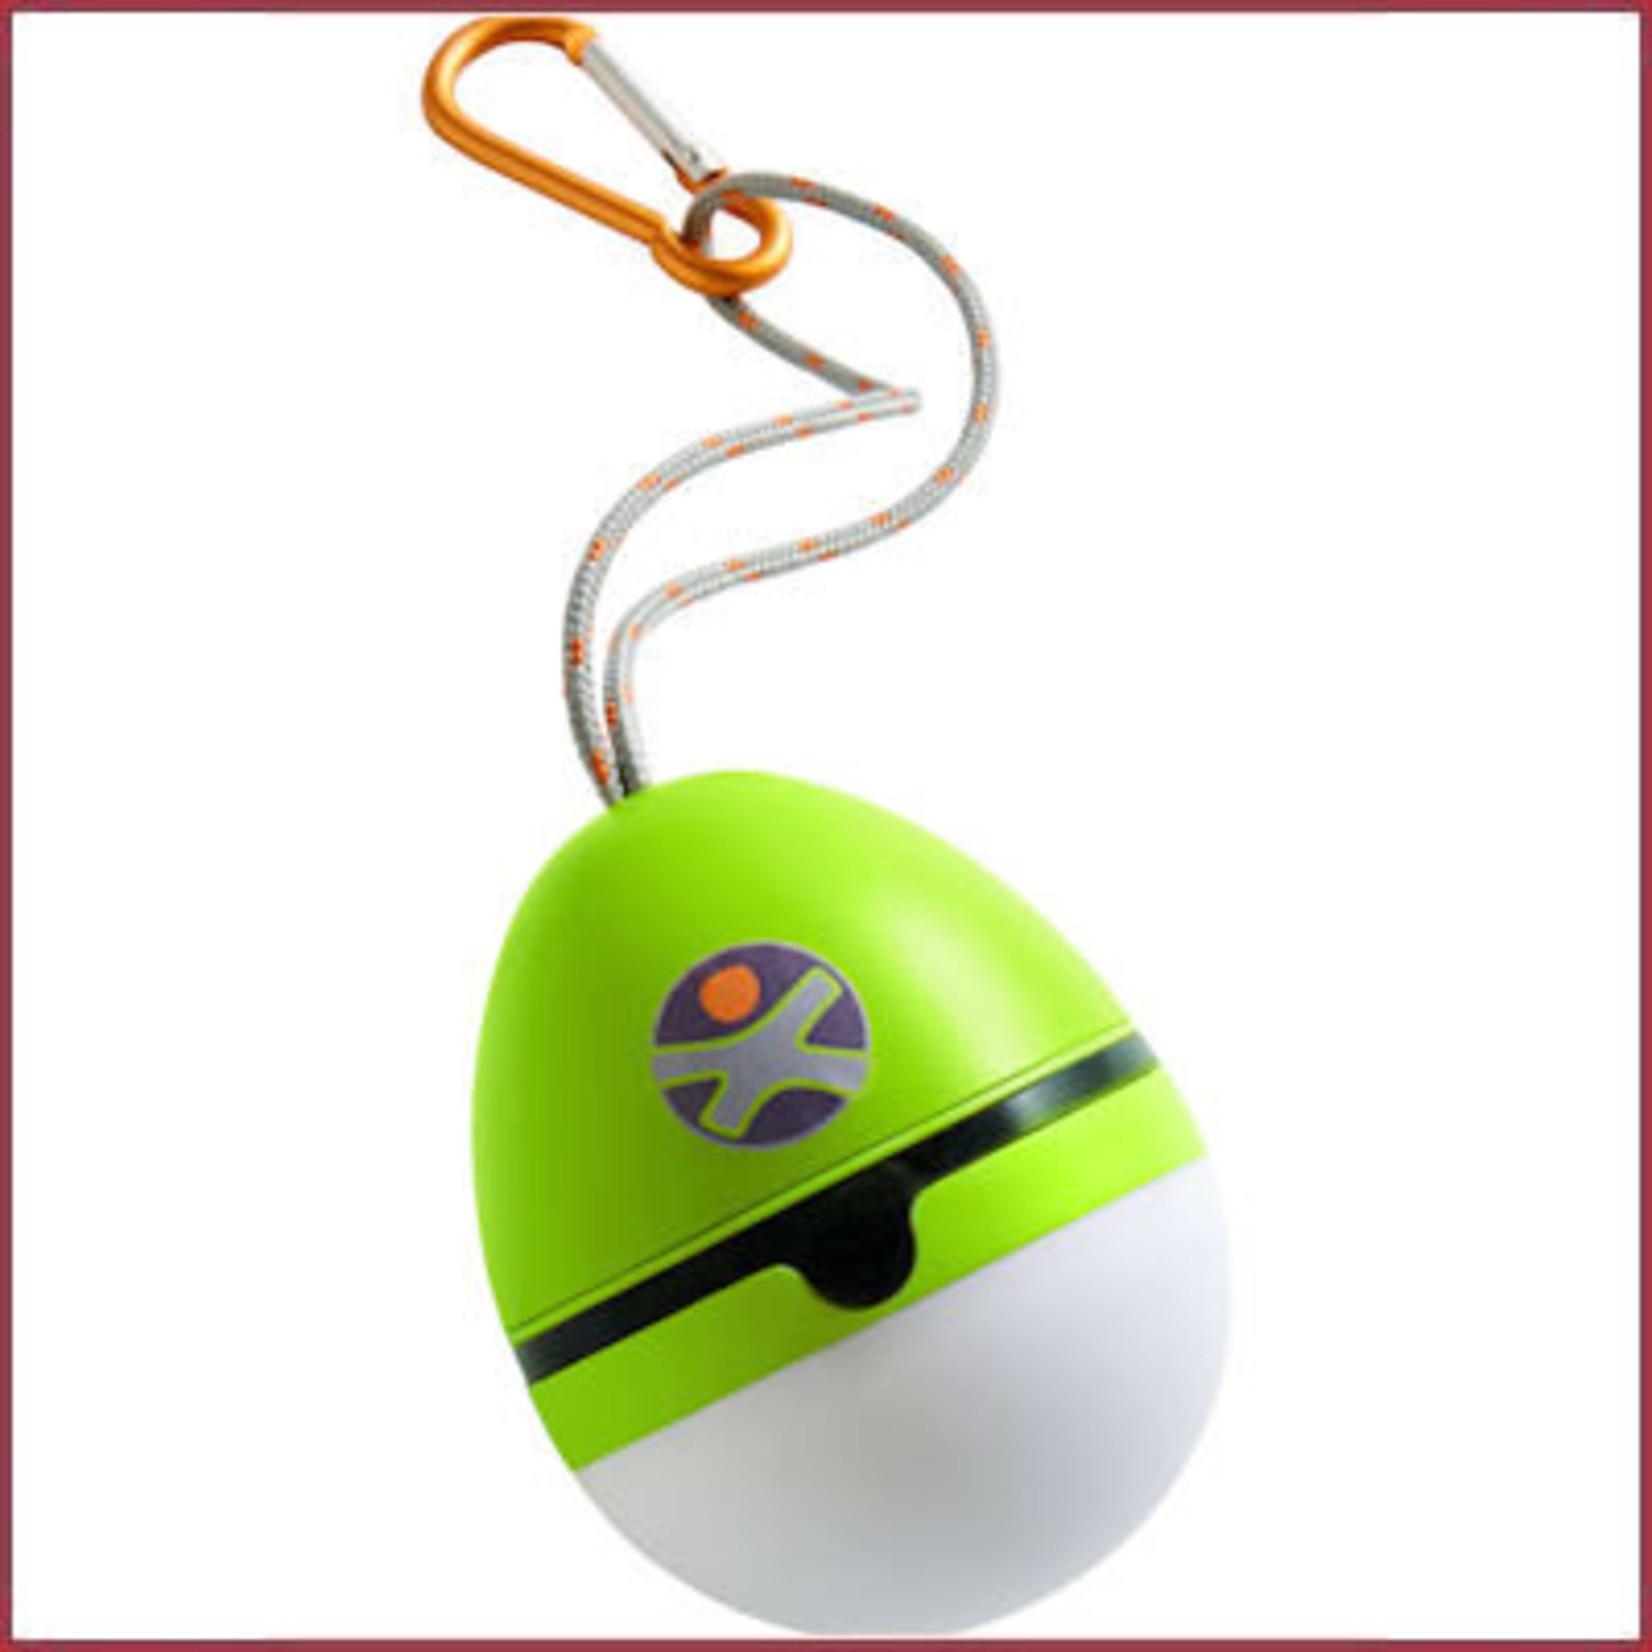 Haba Terra Kids - Tent Lamp